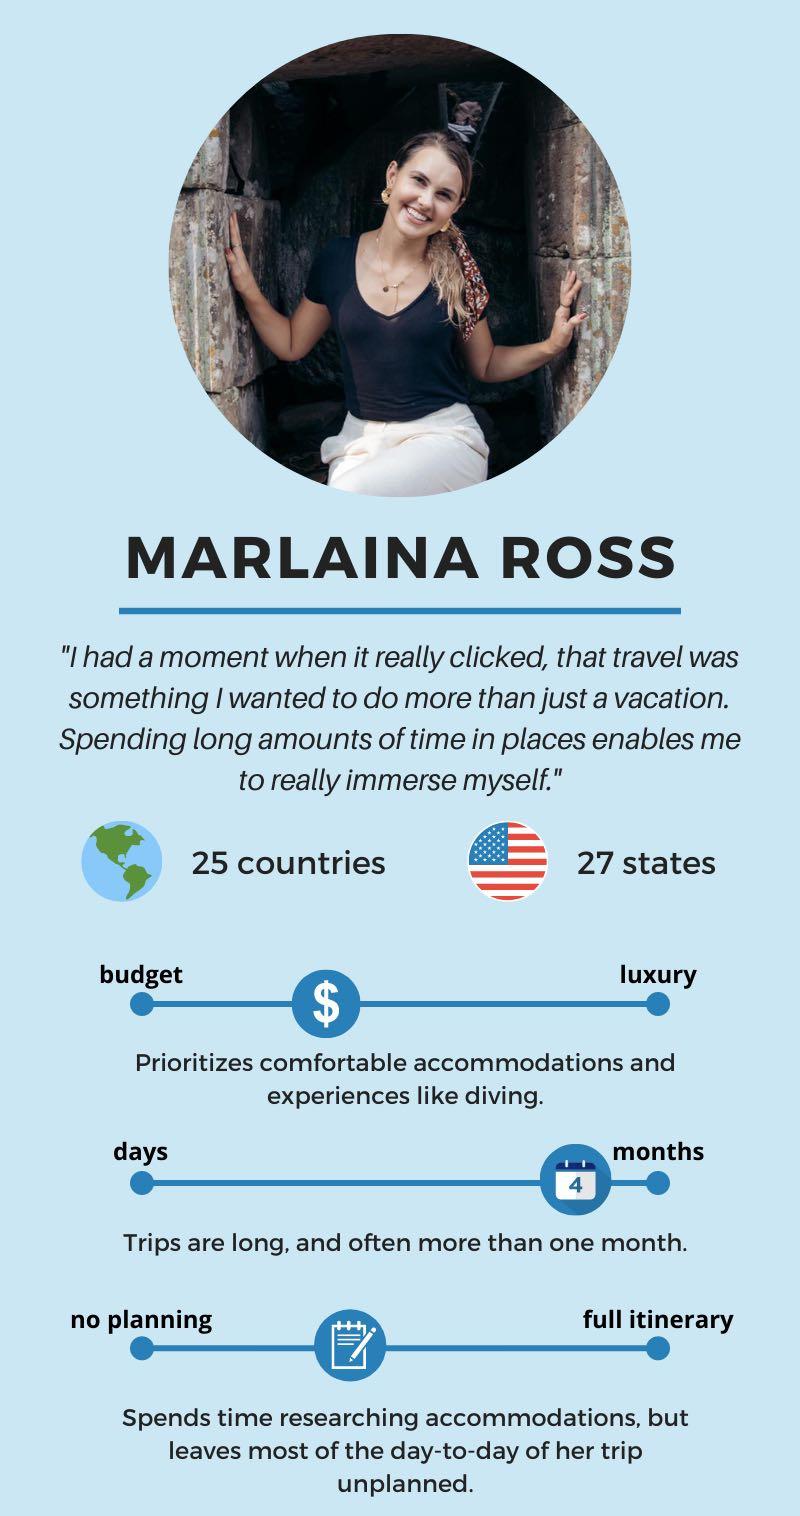 marlaina ross travel profile